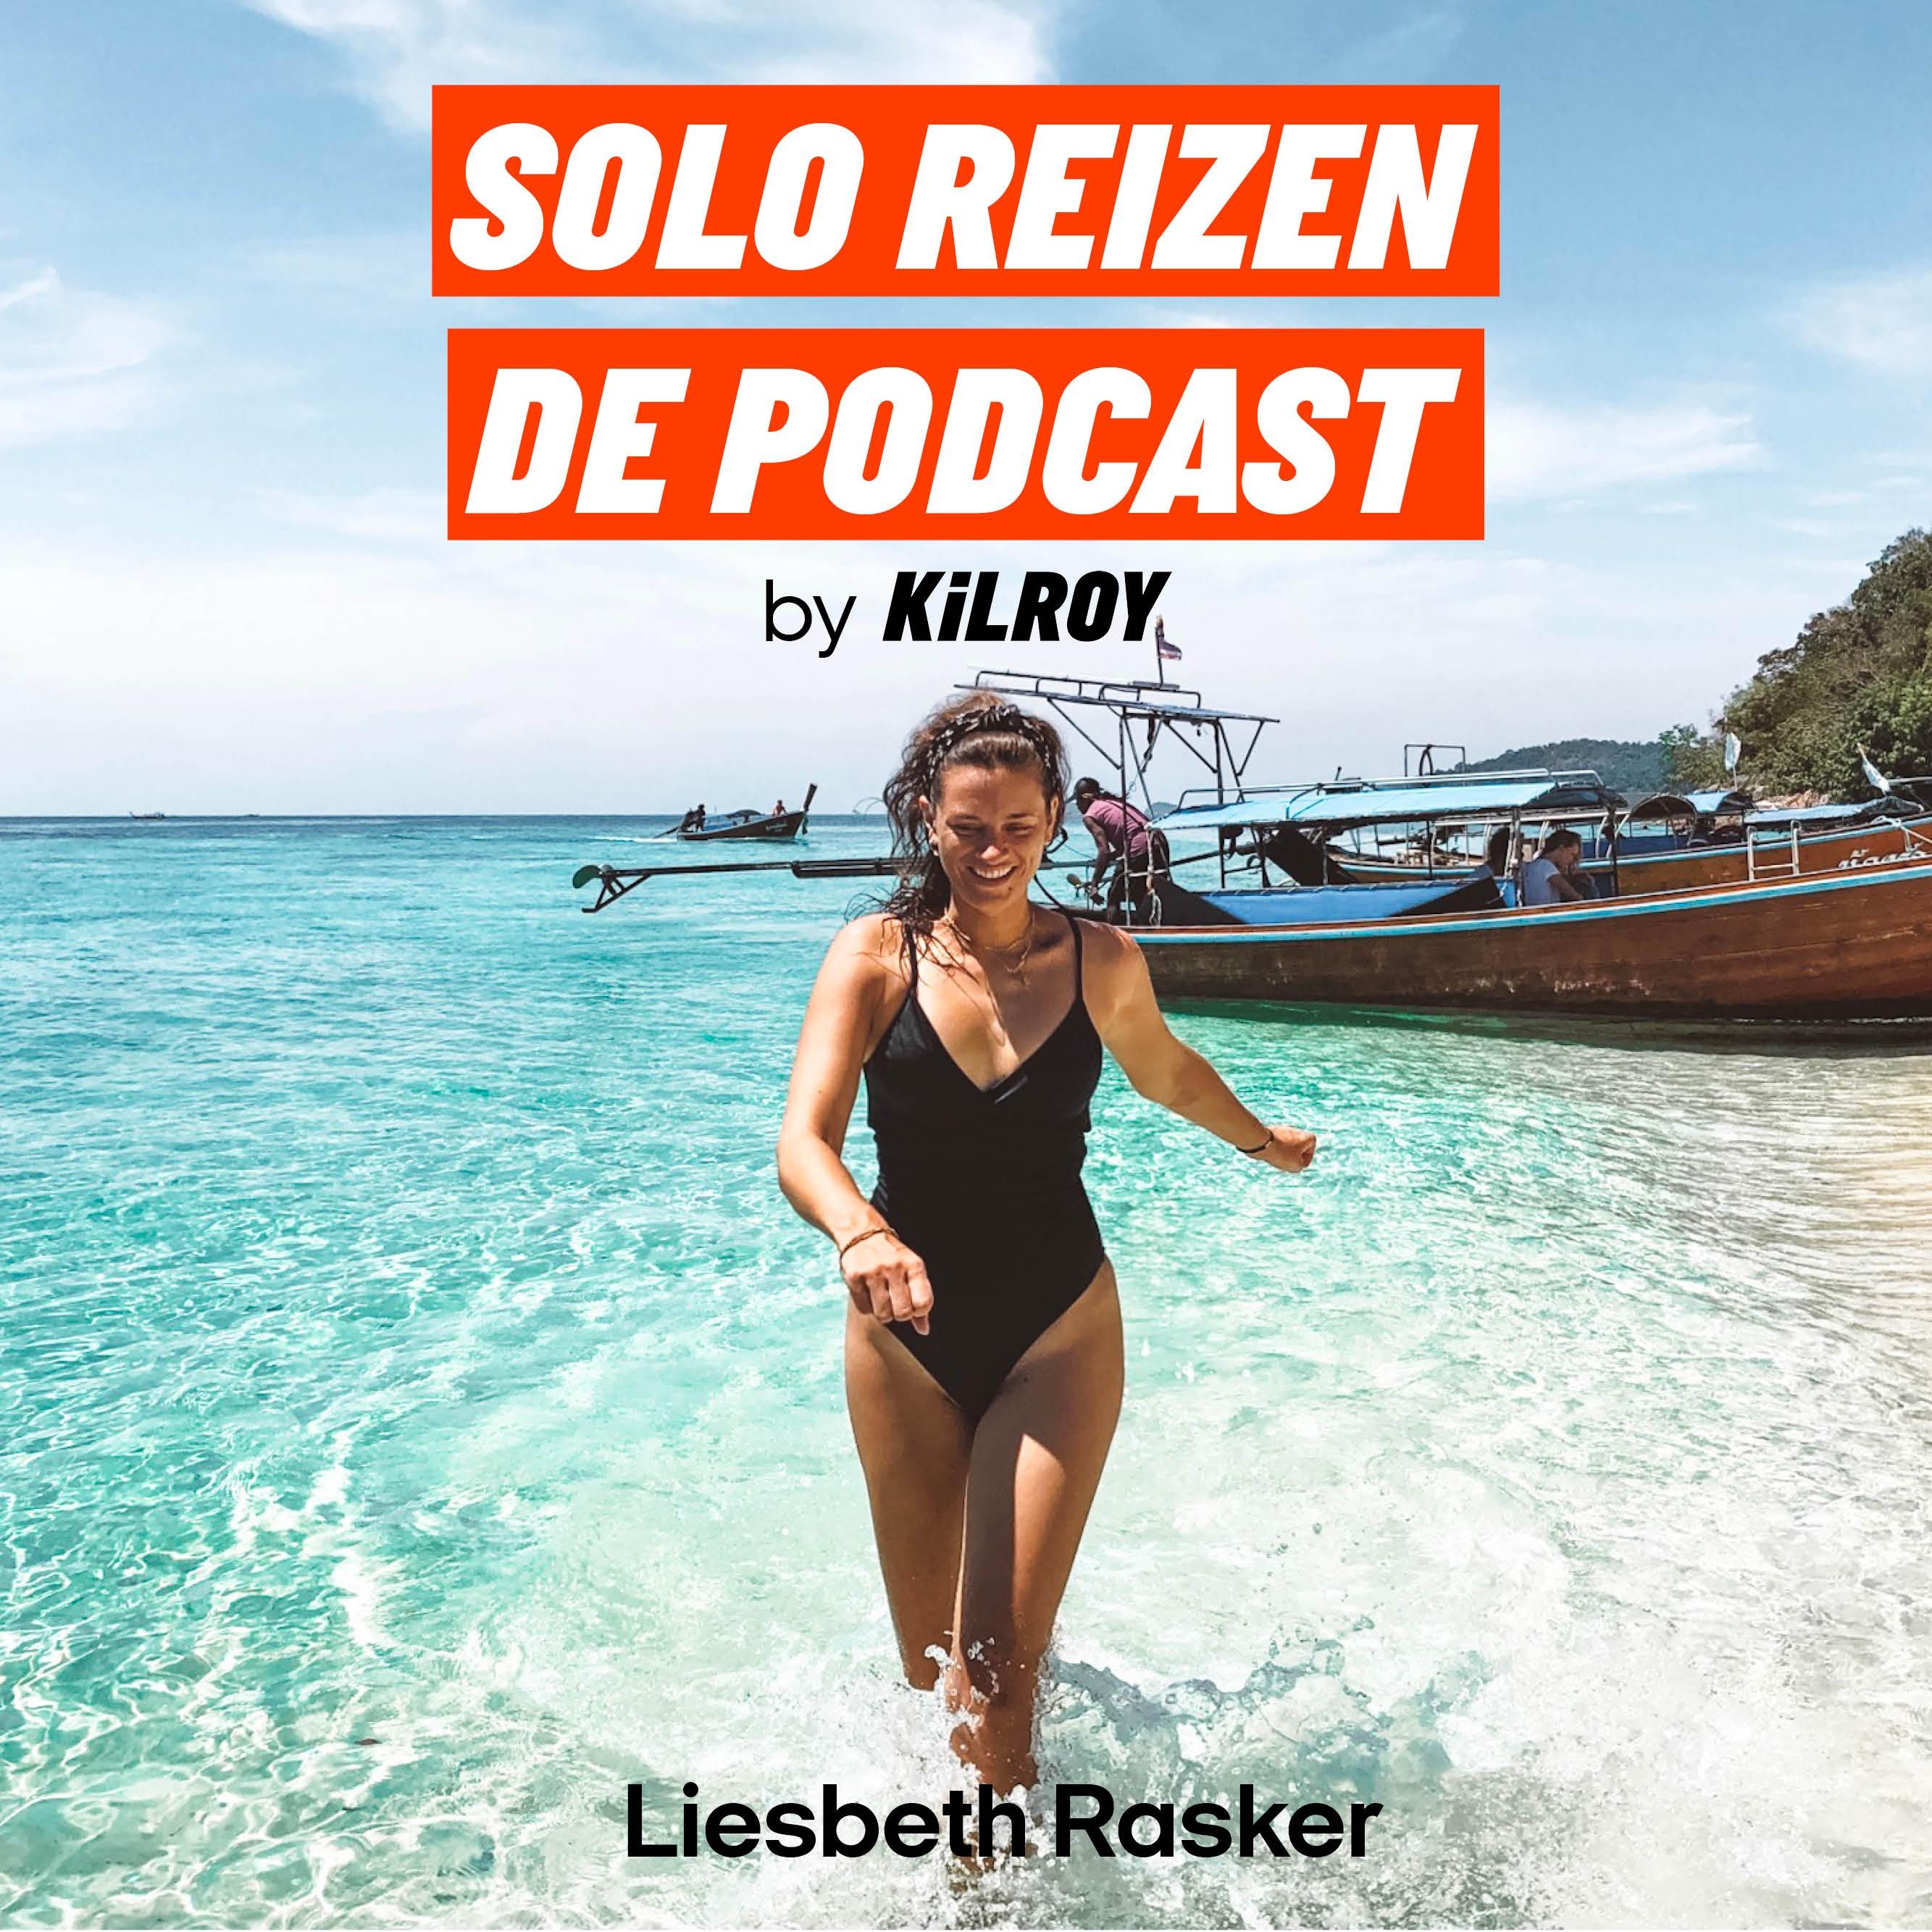 Solo reizen de Podcast logo